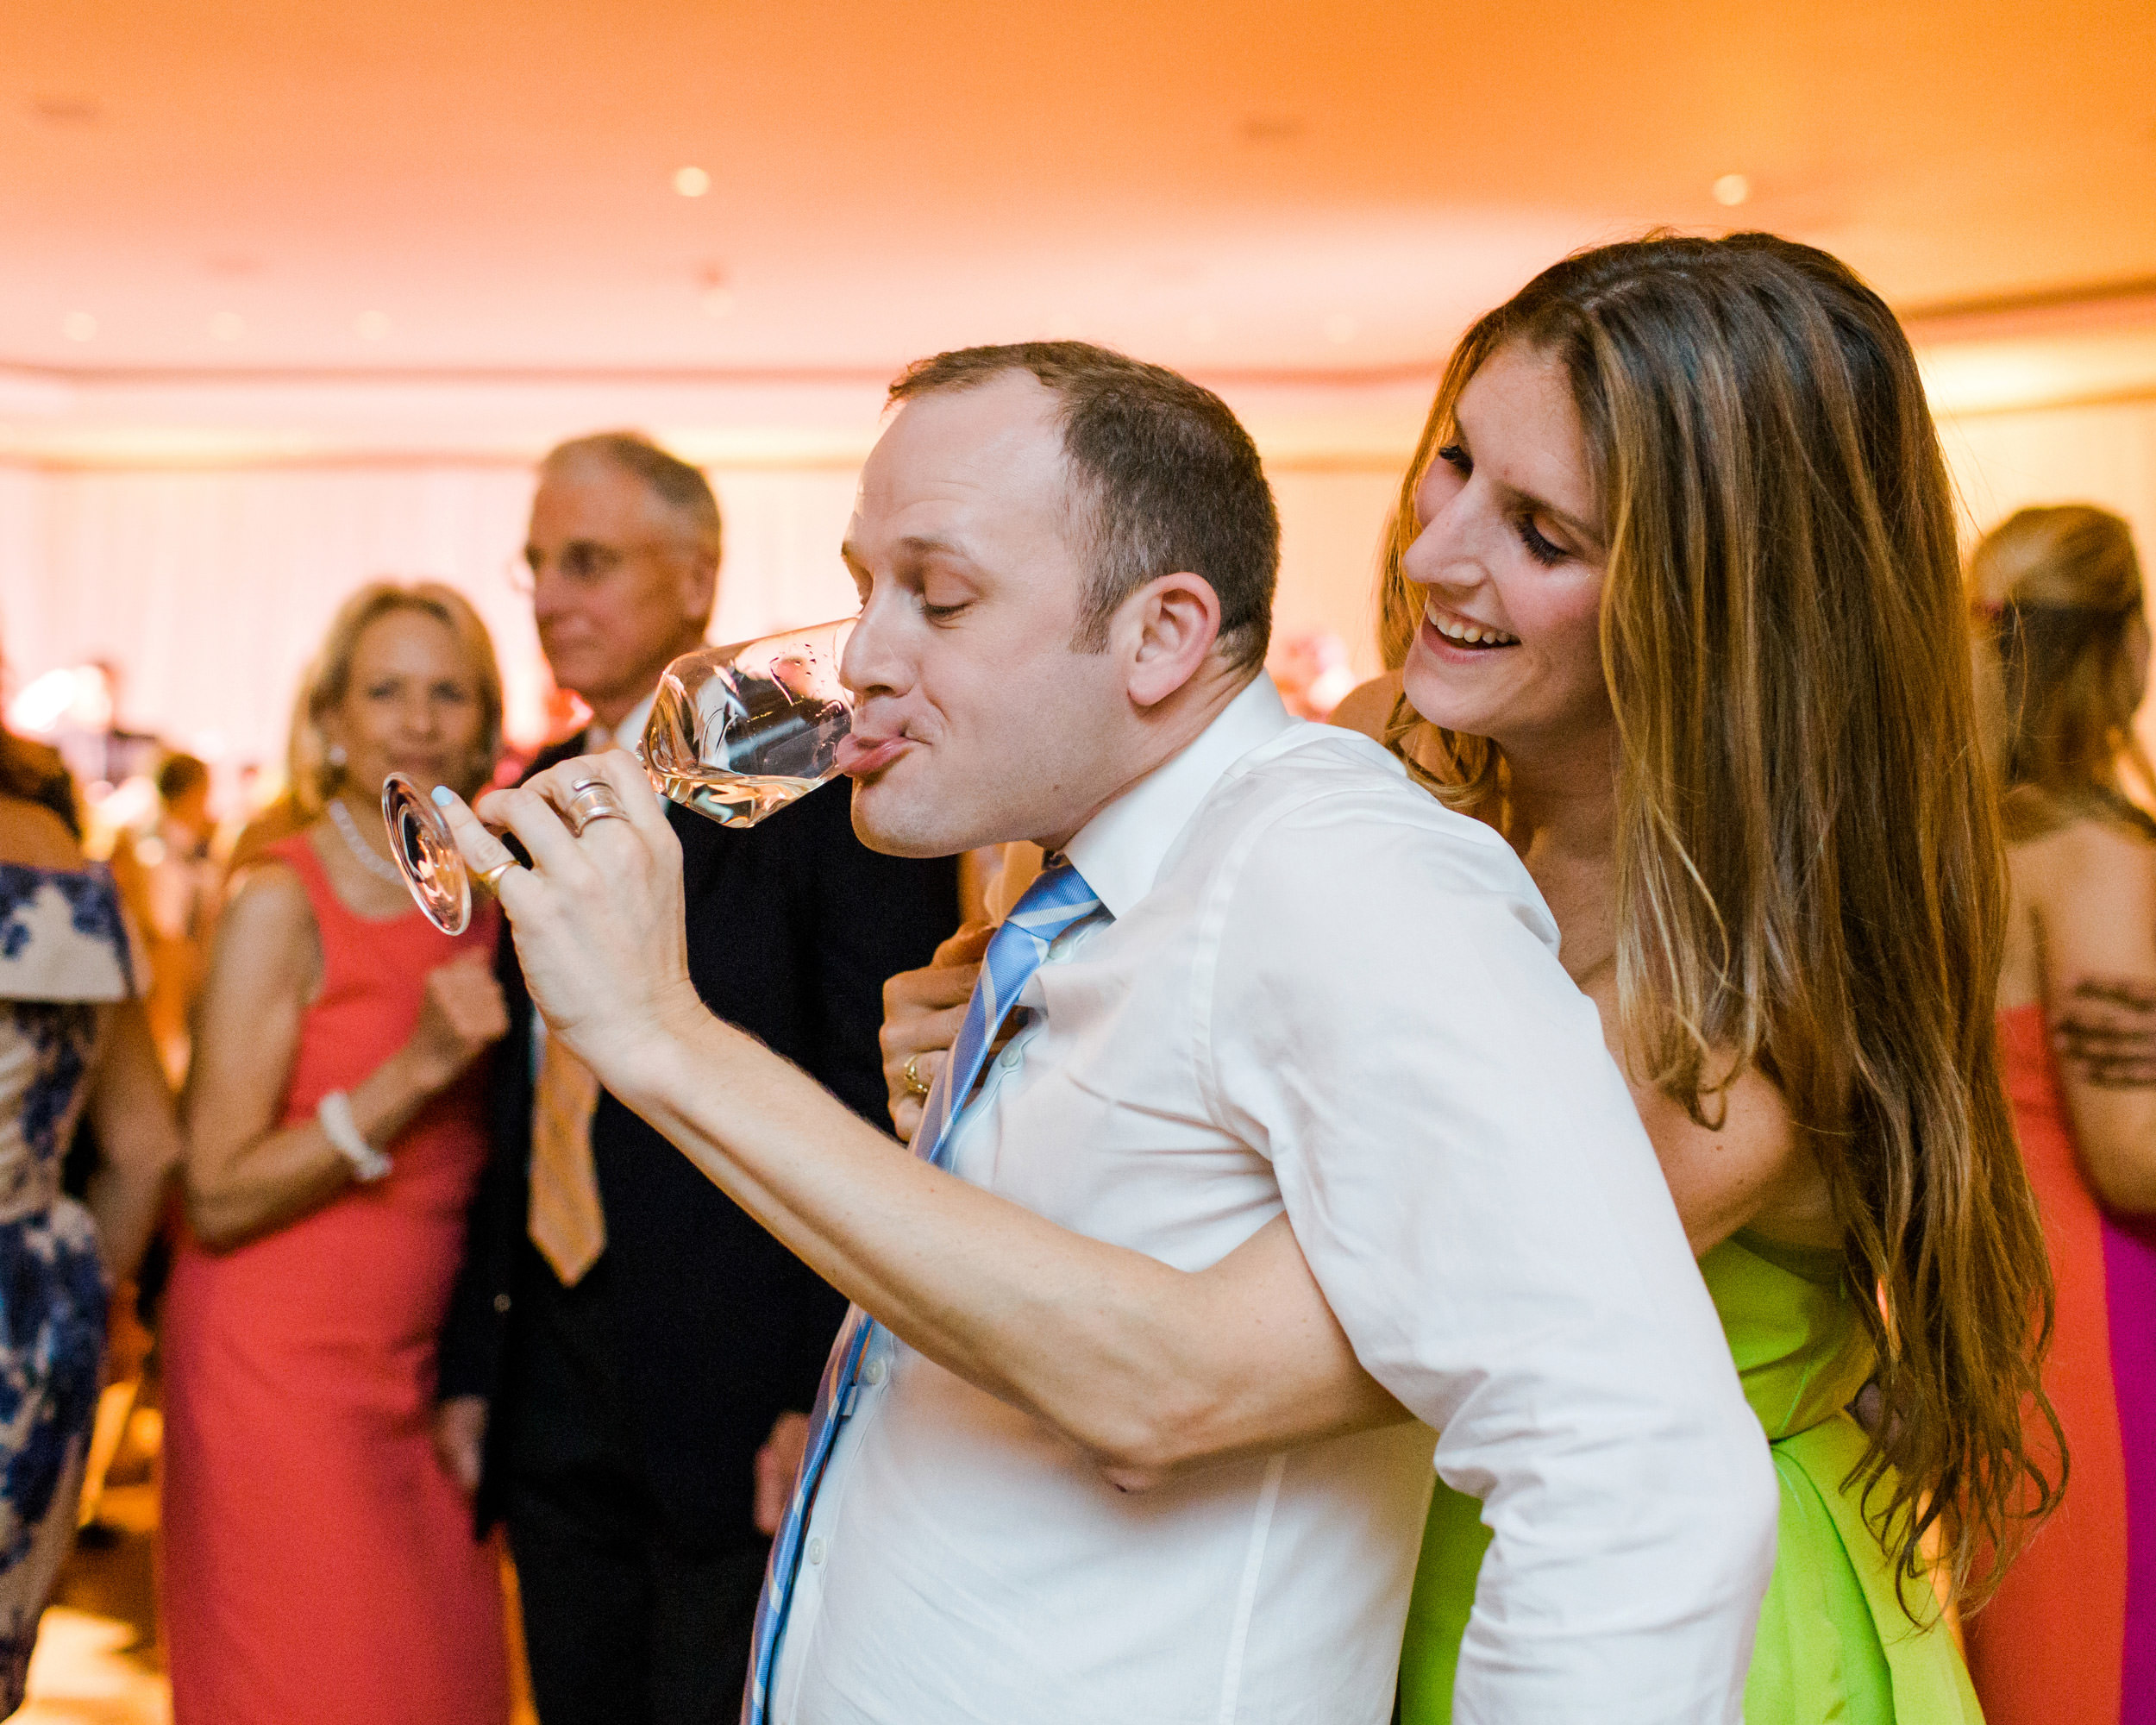 biltmore_santa_barbara_wedding_photos_coral_casino_081.jpg